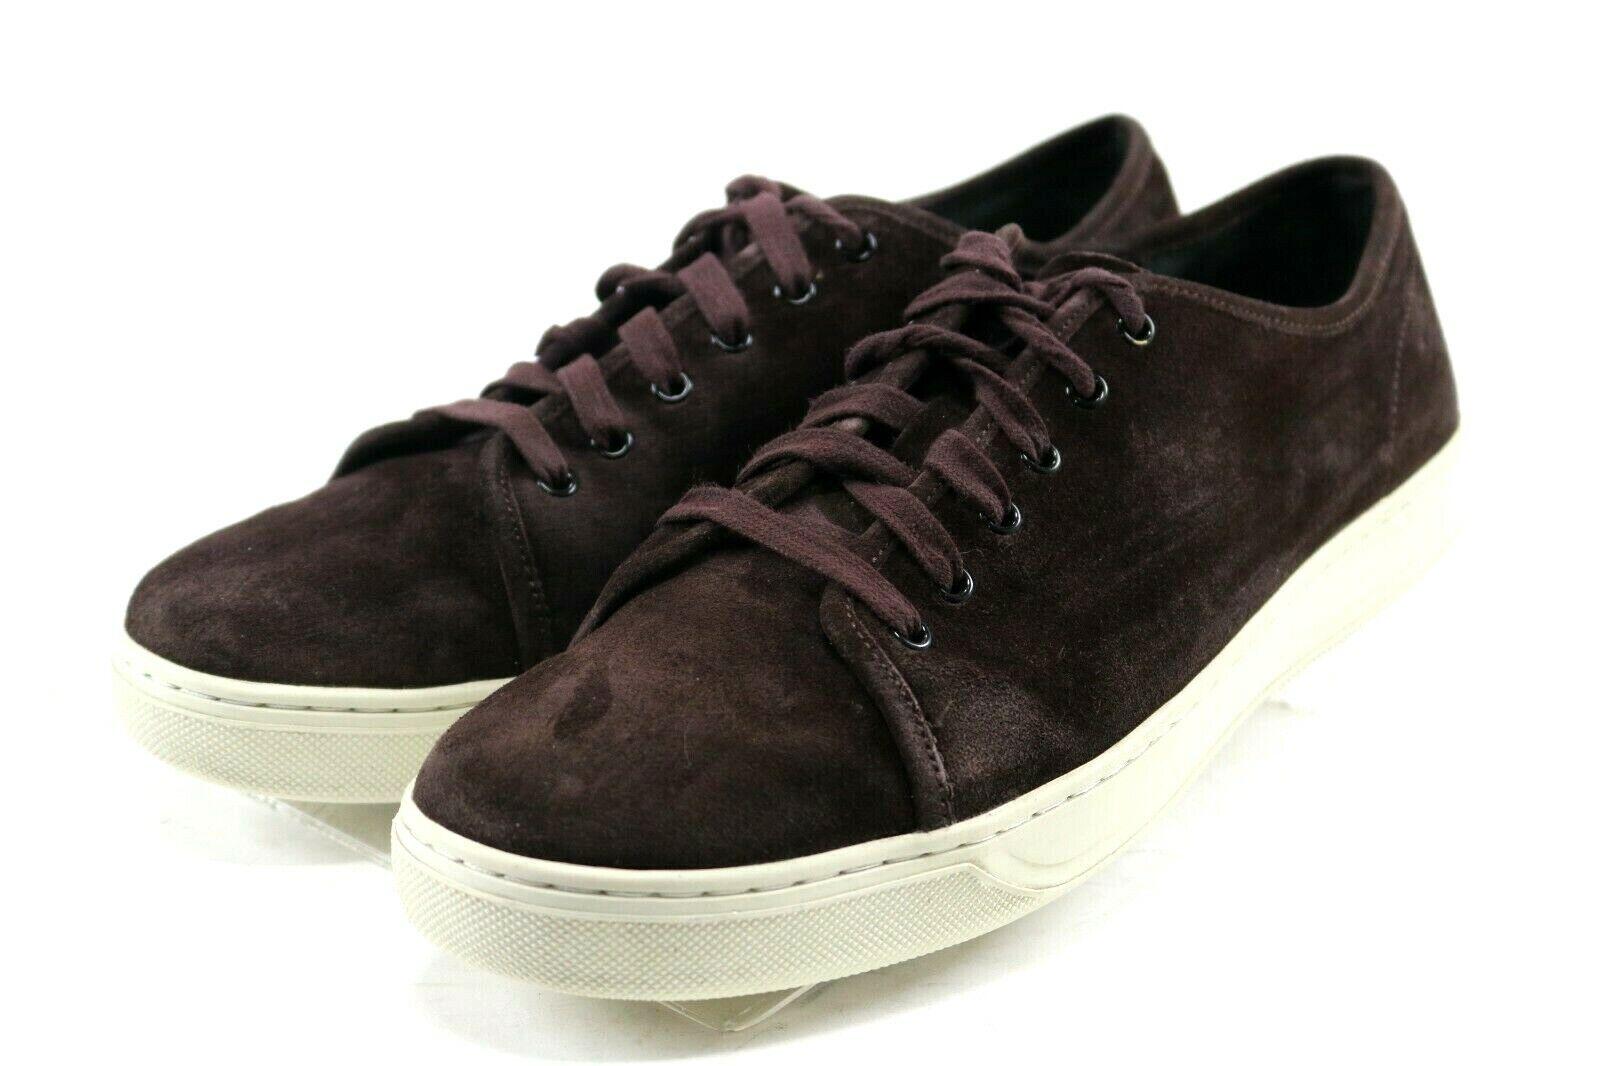 Vince Austin  295 Men's Suede Low-Top Sneaker Size 11 Brown